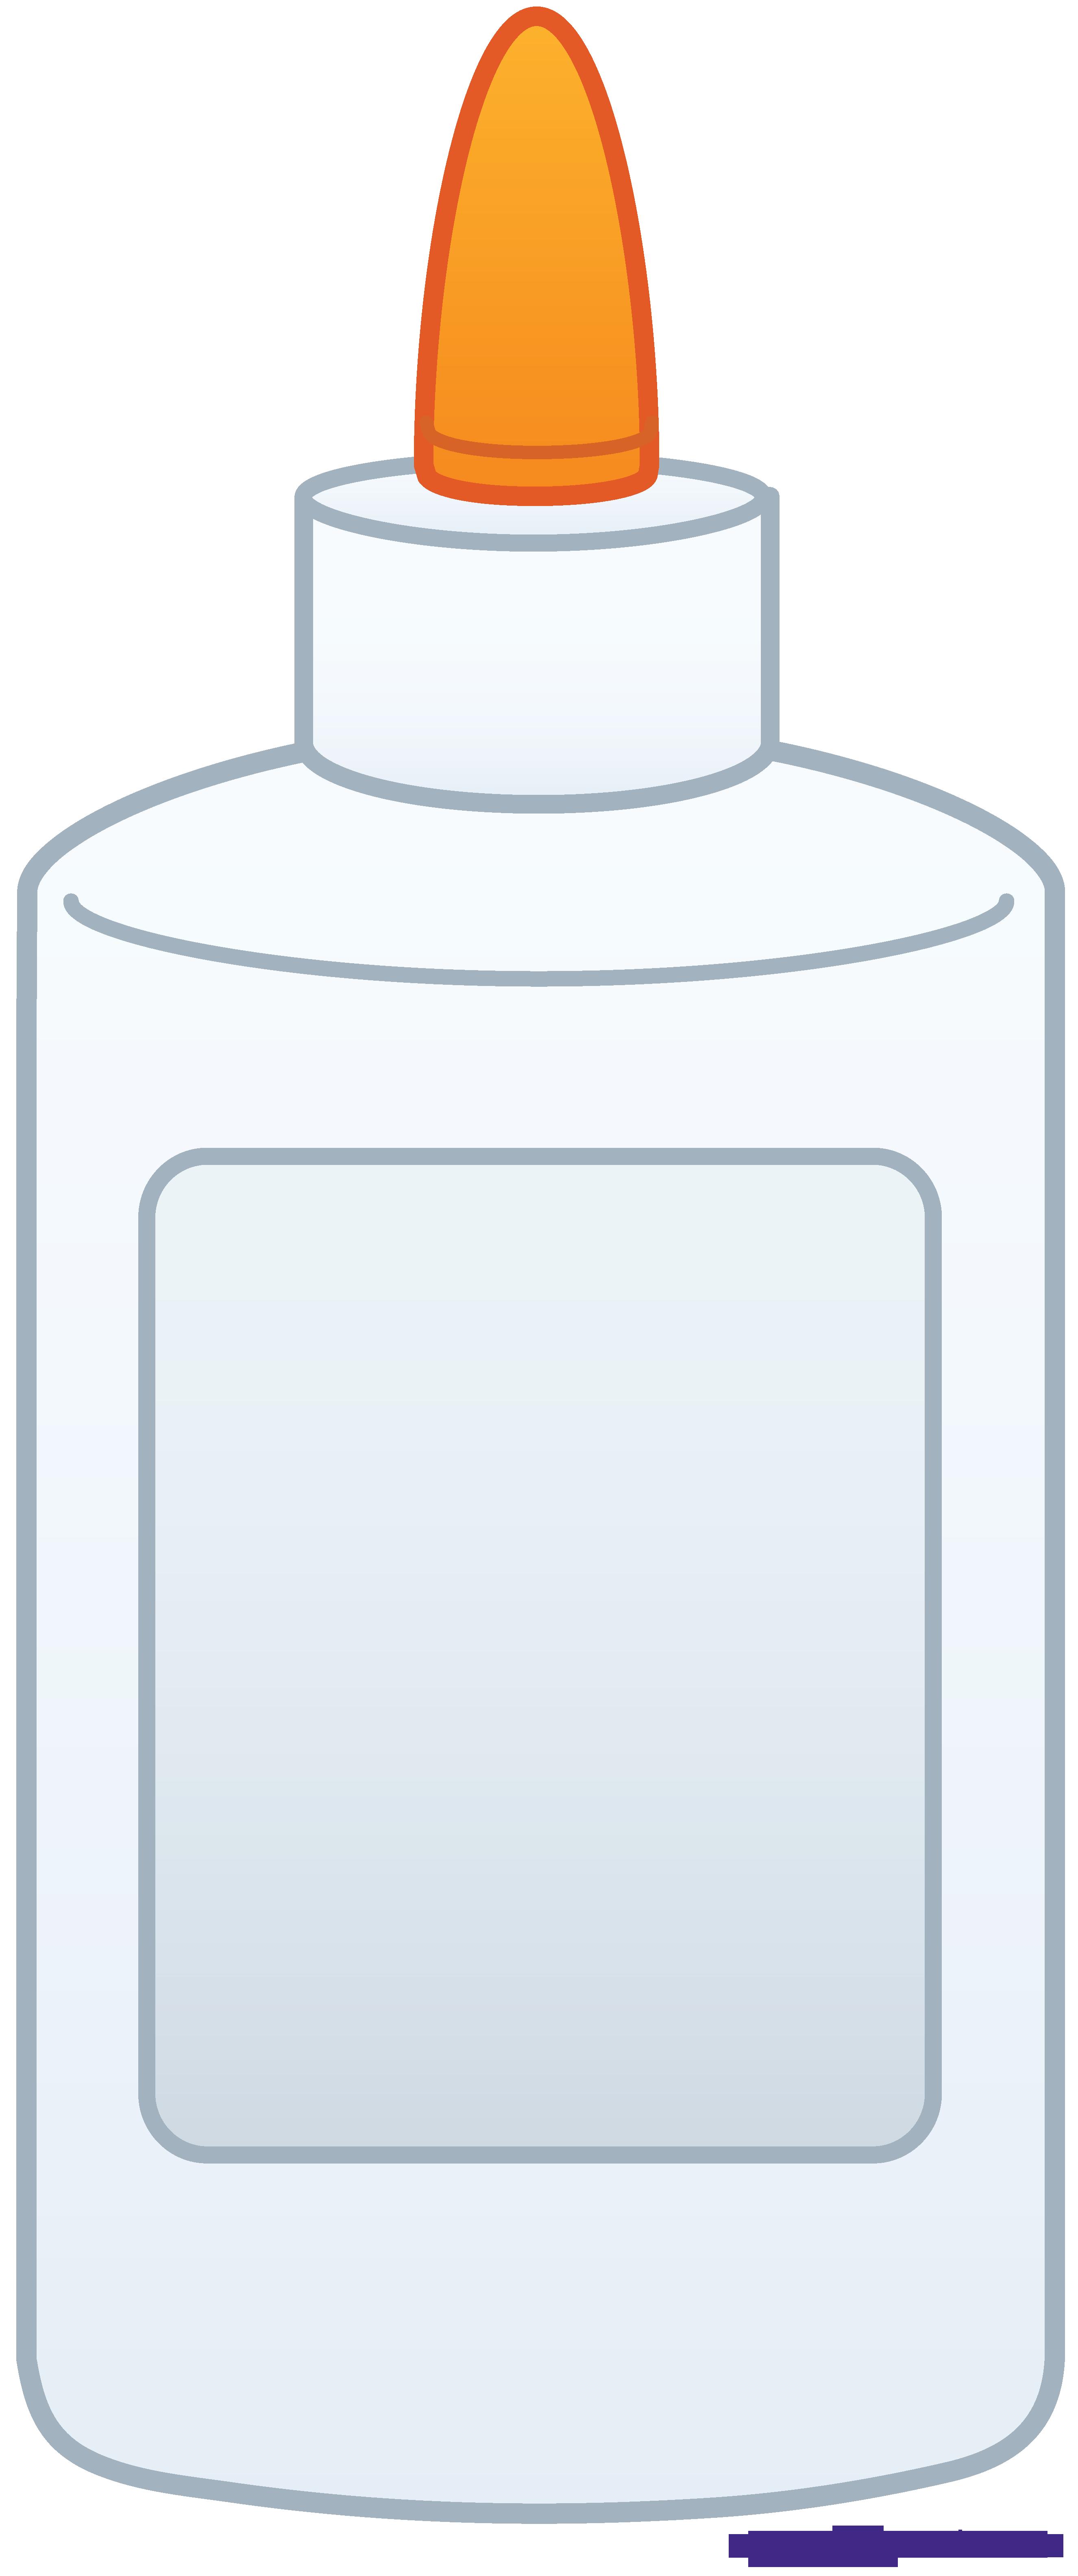 Glue bottle sweet clip. Clipart milk liquid object